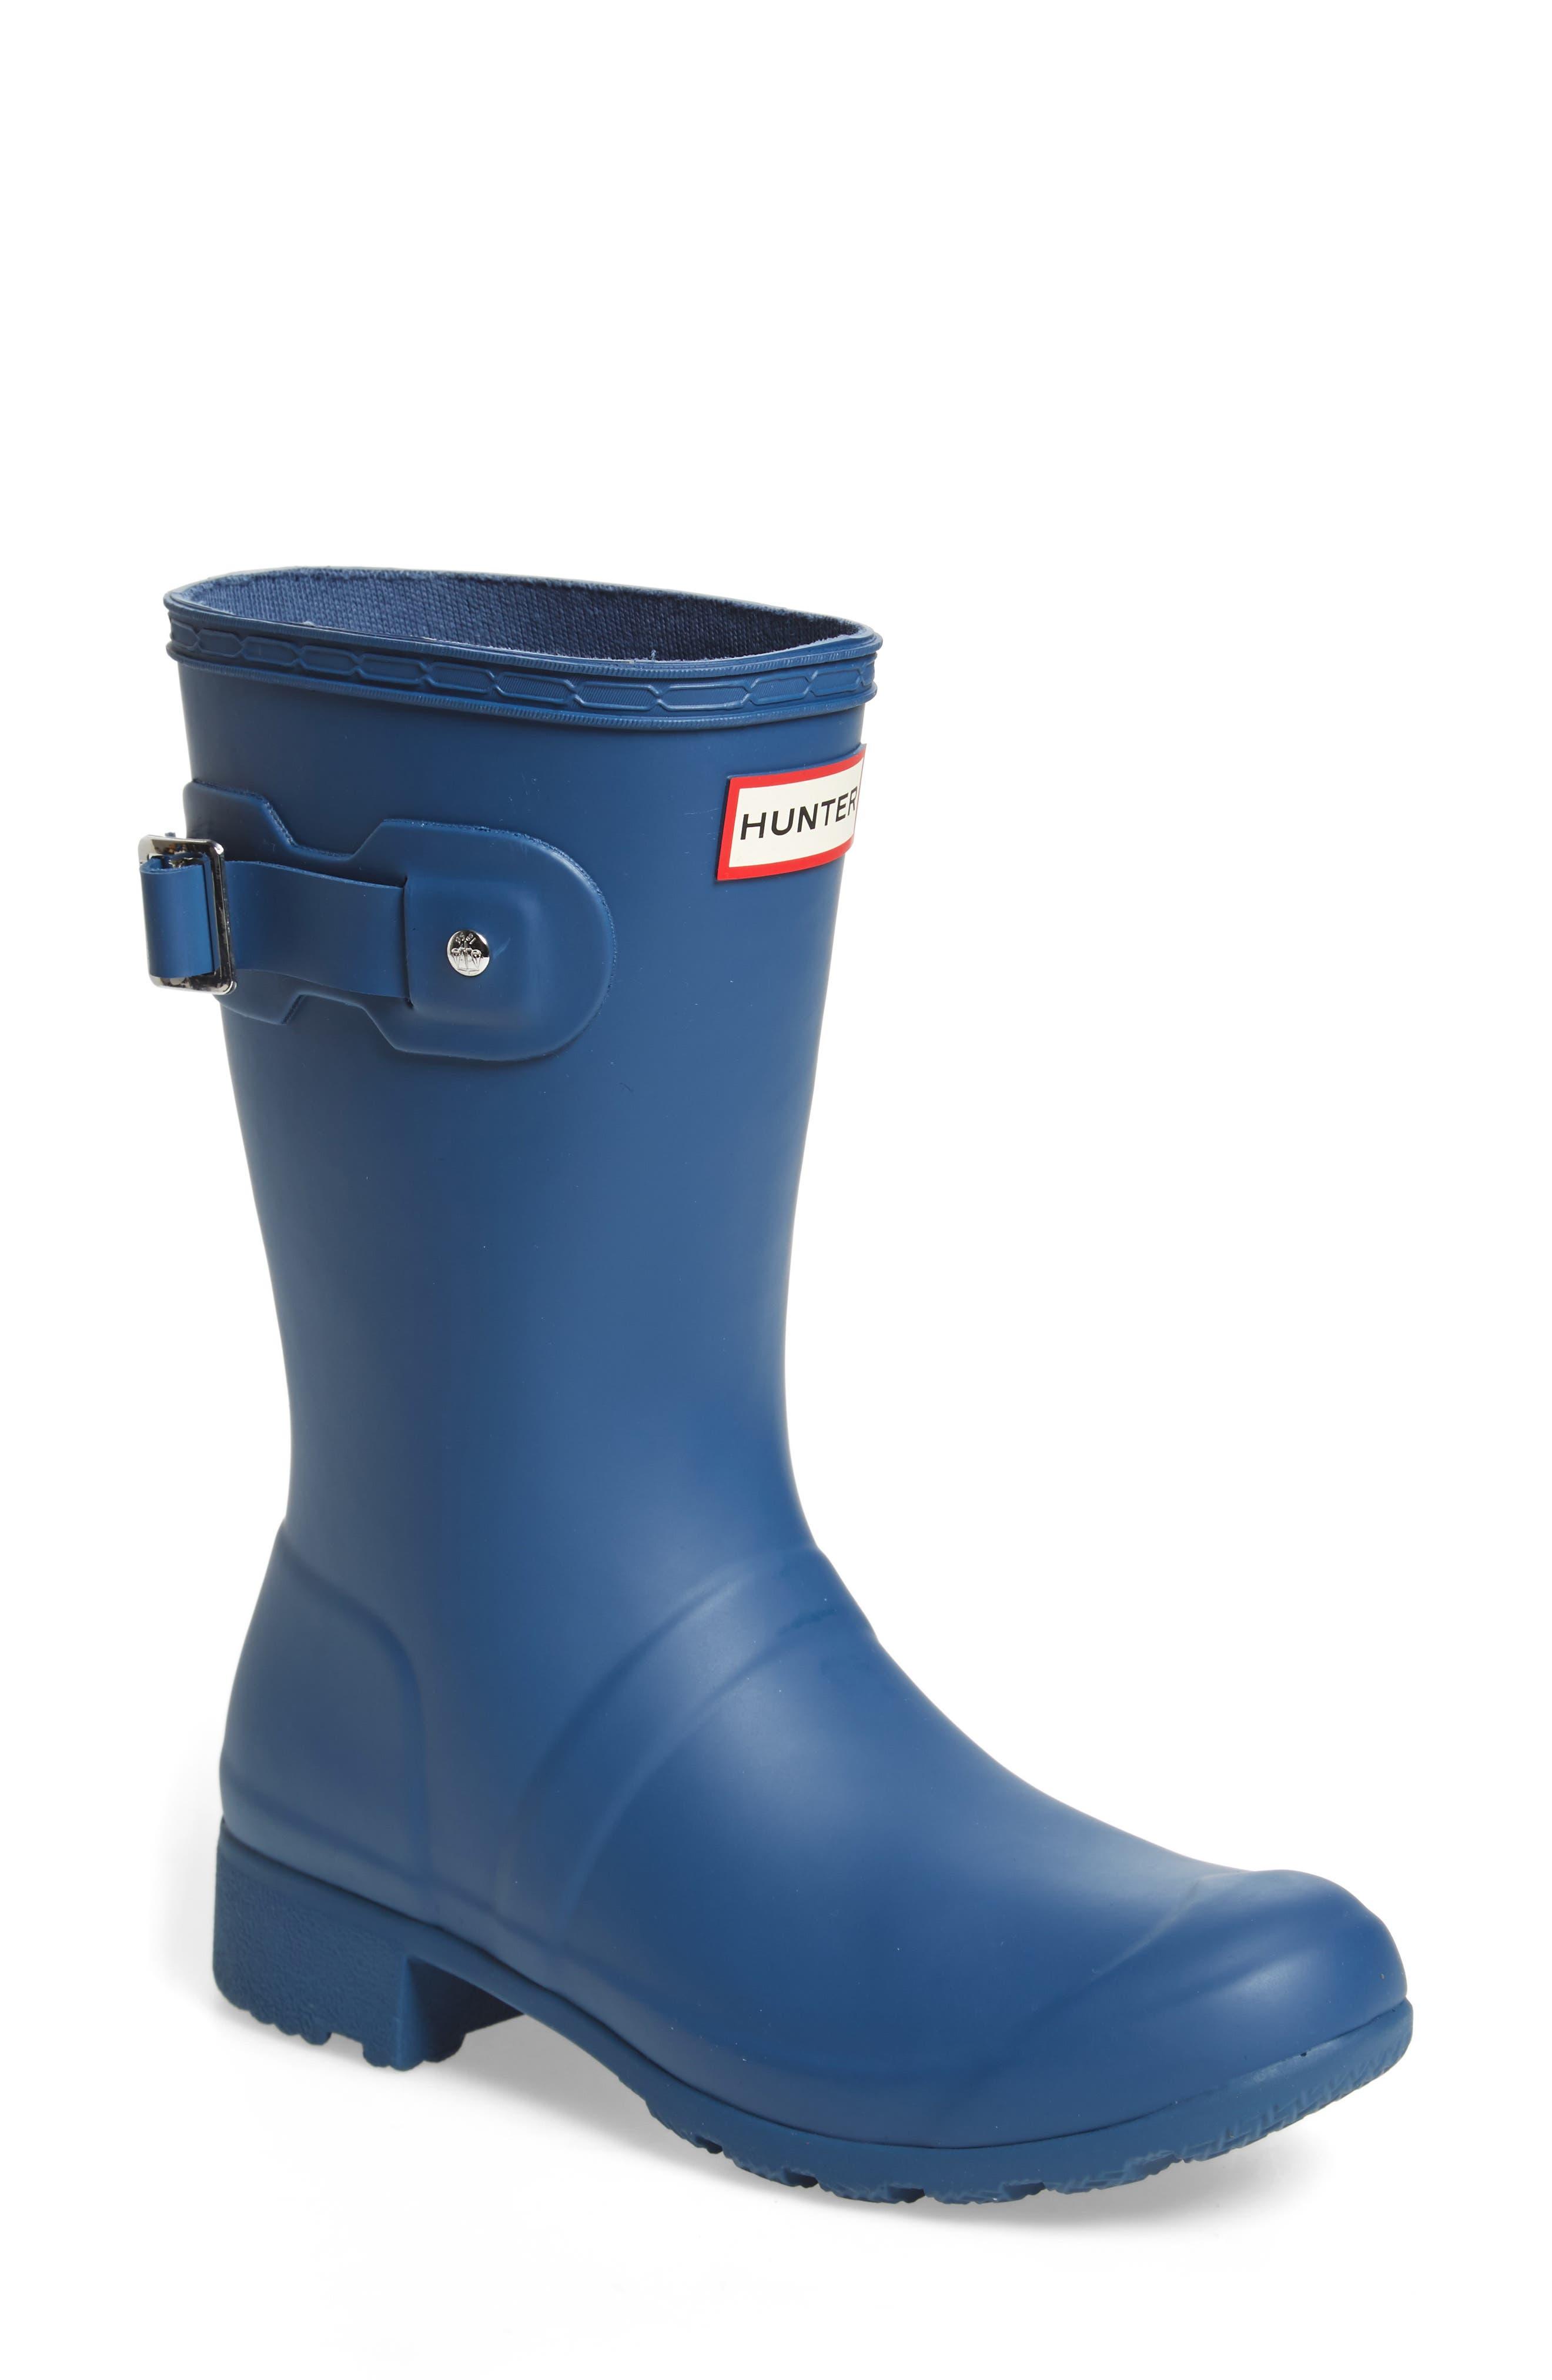 Alternate Image 1 Selected - Hunter Original Tour Short Packable Rain Boot (Women)